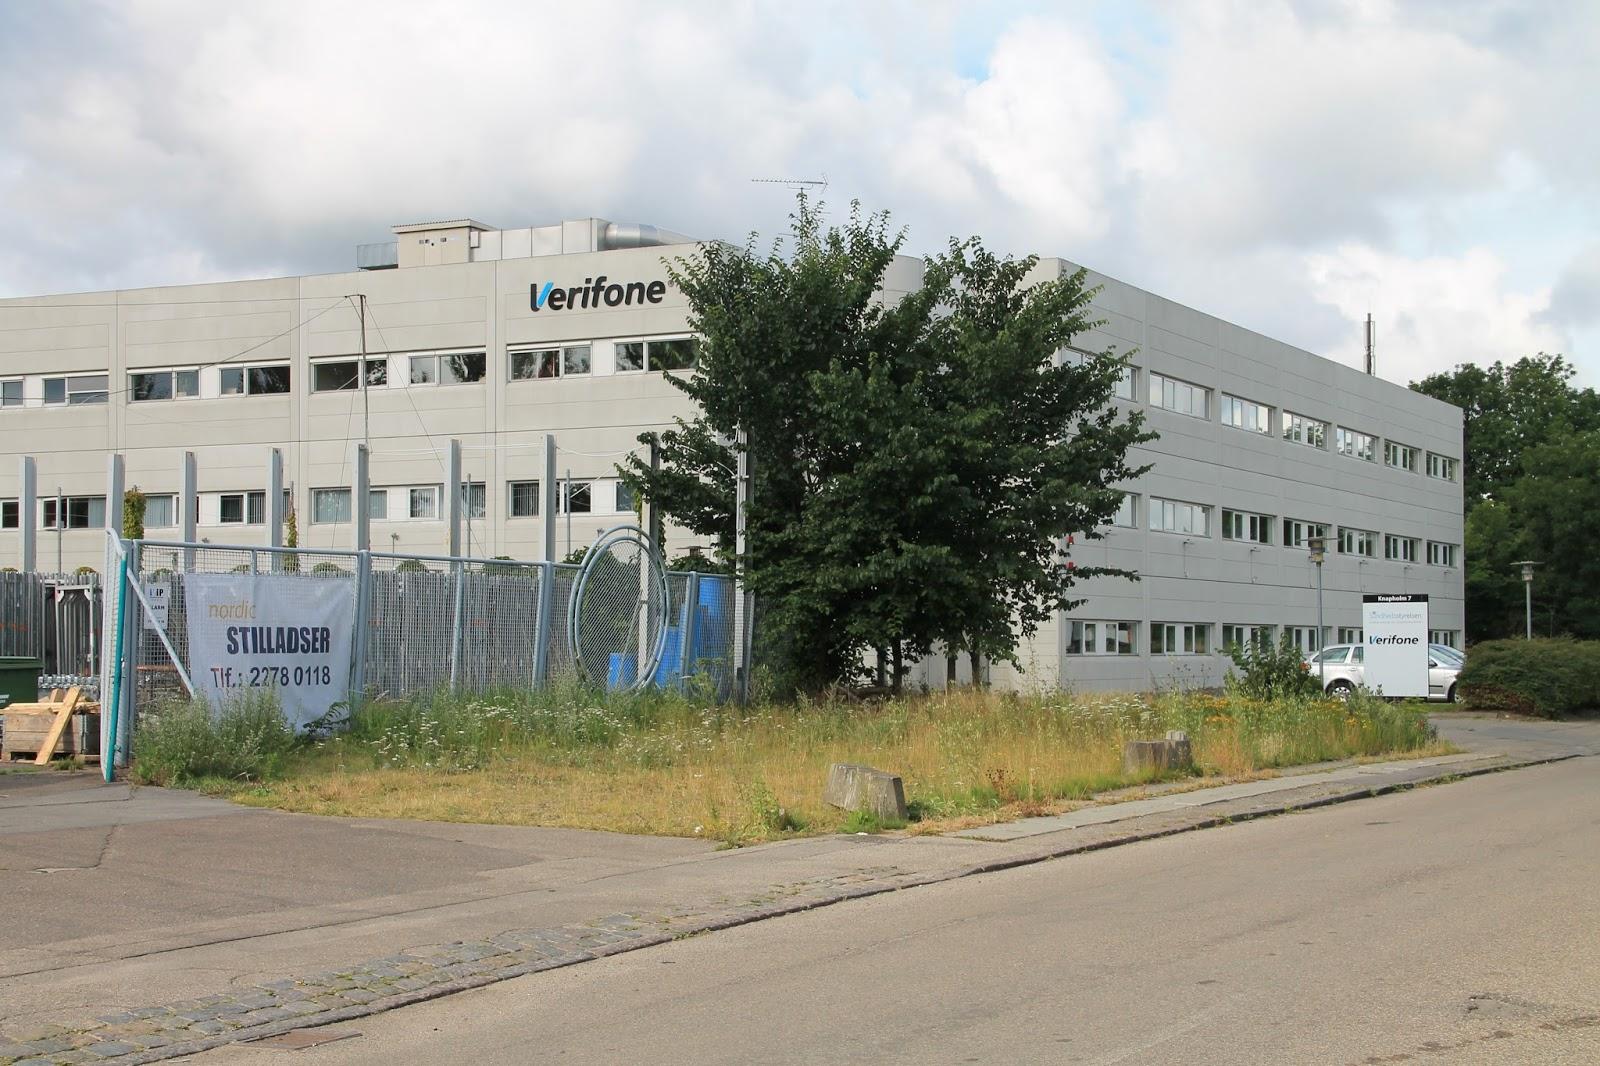 Vandringsløse Tidende: Sømose Å vs. Mileparken Erhvervsområde og Industrikvarter